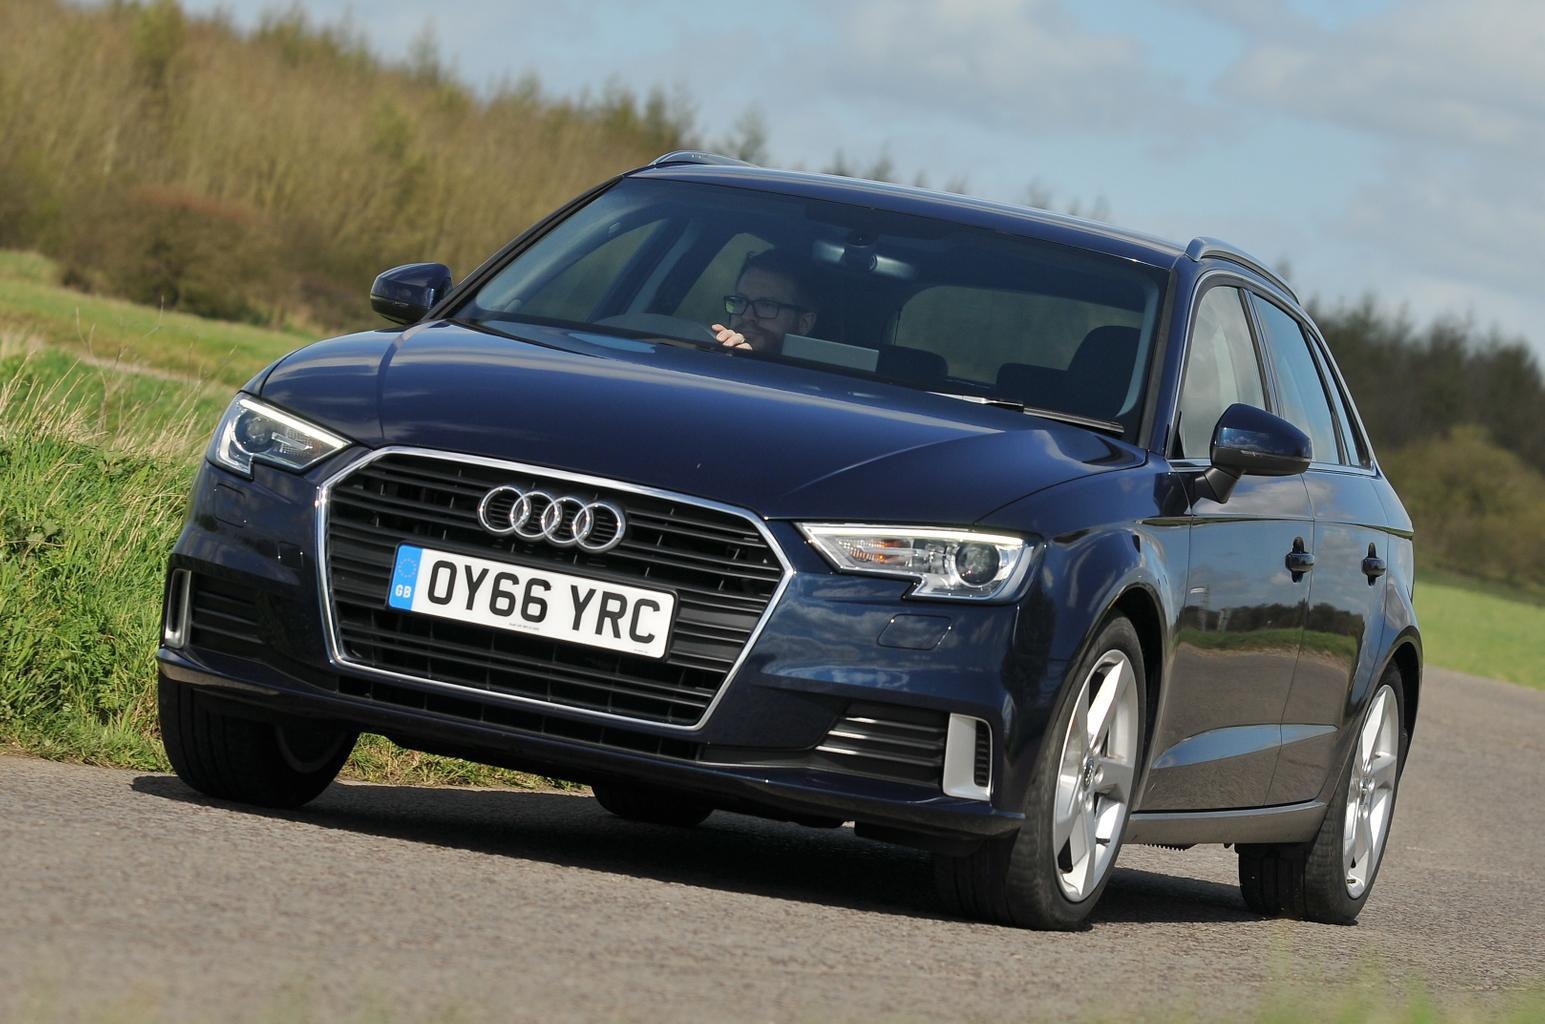 New Volkswagen Golf and Honda Civic vs Audi A3 Sportback